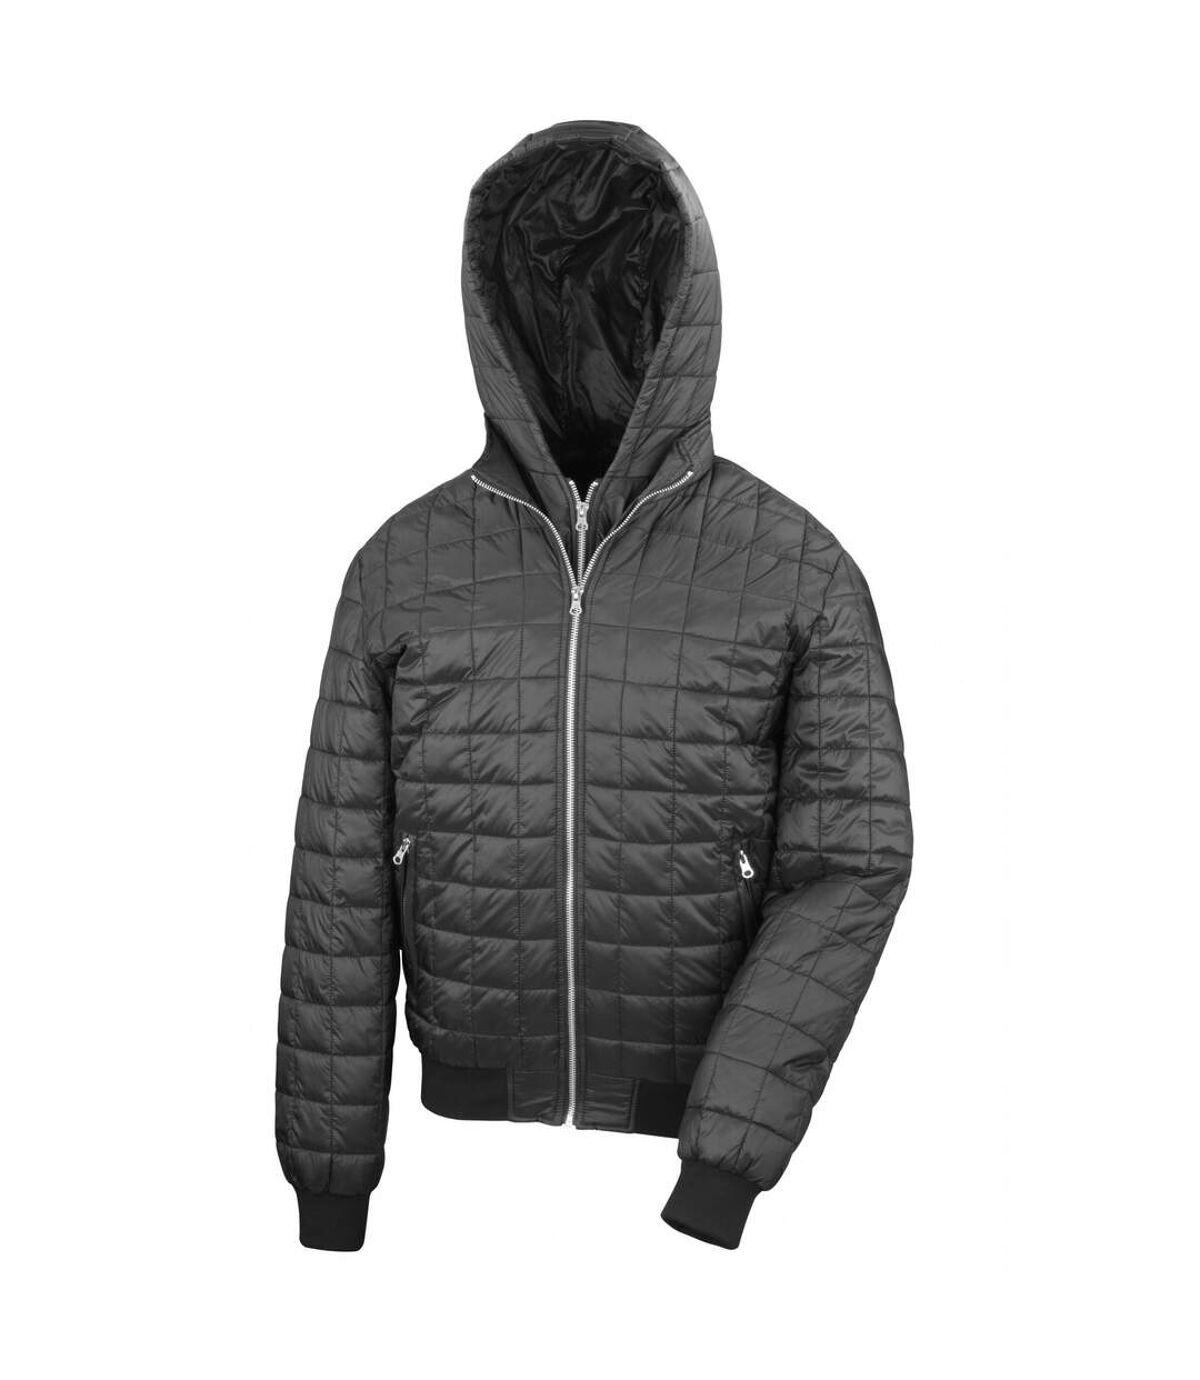 Result Mens Urban Outdoor Stealth Hooded Jacket (Black) - UTRW5160